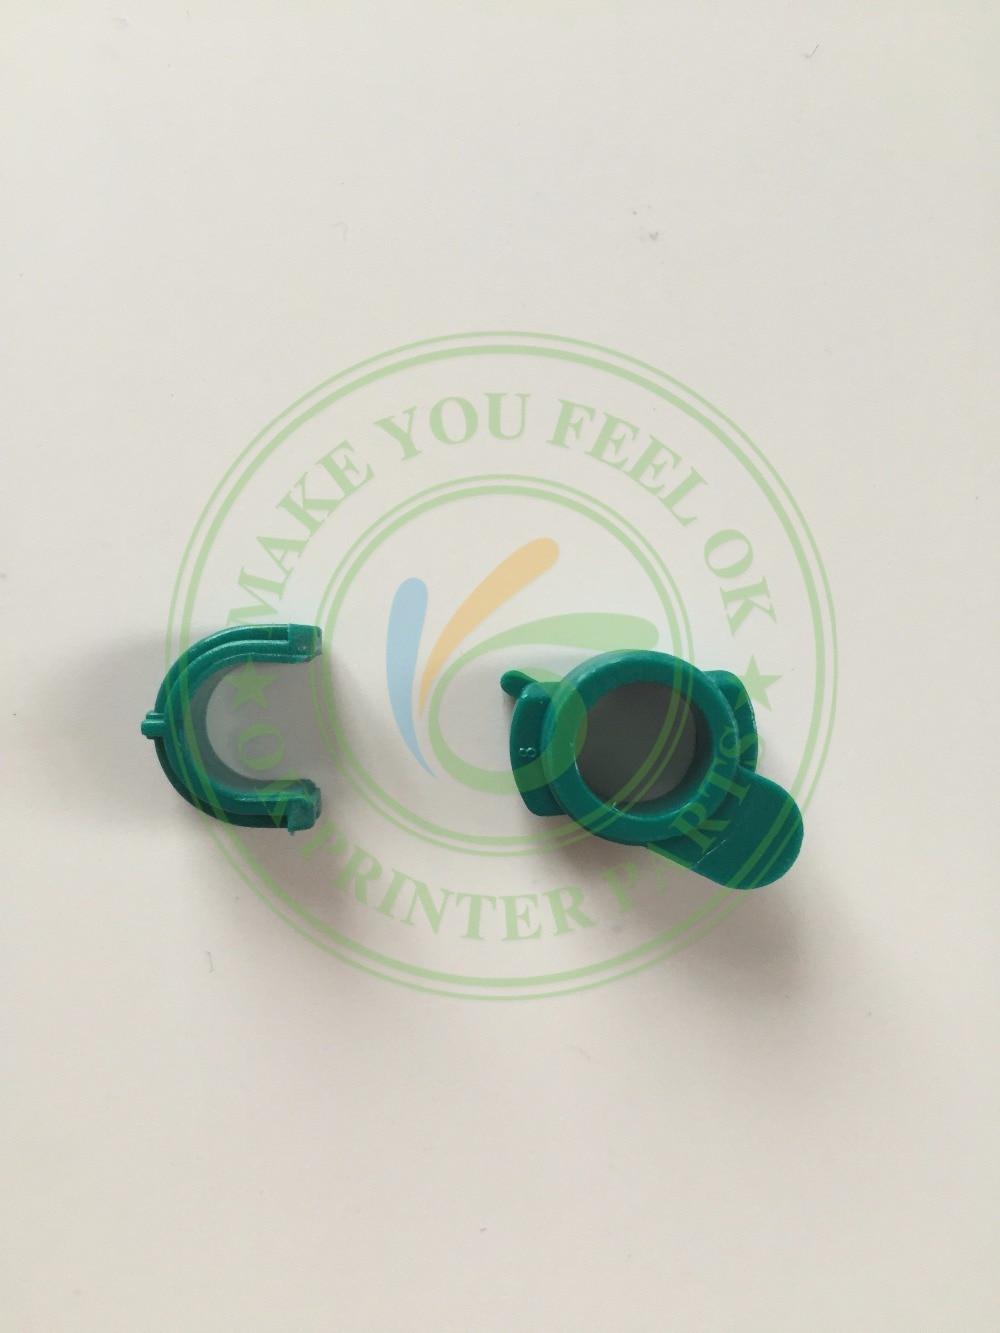 10SET X RC1-3361-000 RC1-3362-000 Pressure roller Bushing Lower Roller Bushing for HP 4200 4250 4300 4350 4345 1 x new fuser service kit for hp laserjet 4250 4300 4350 4345 fuser film sleeve fuser pressure roller bushing